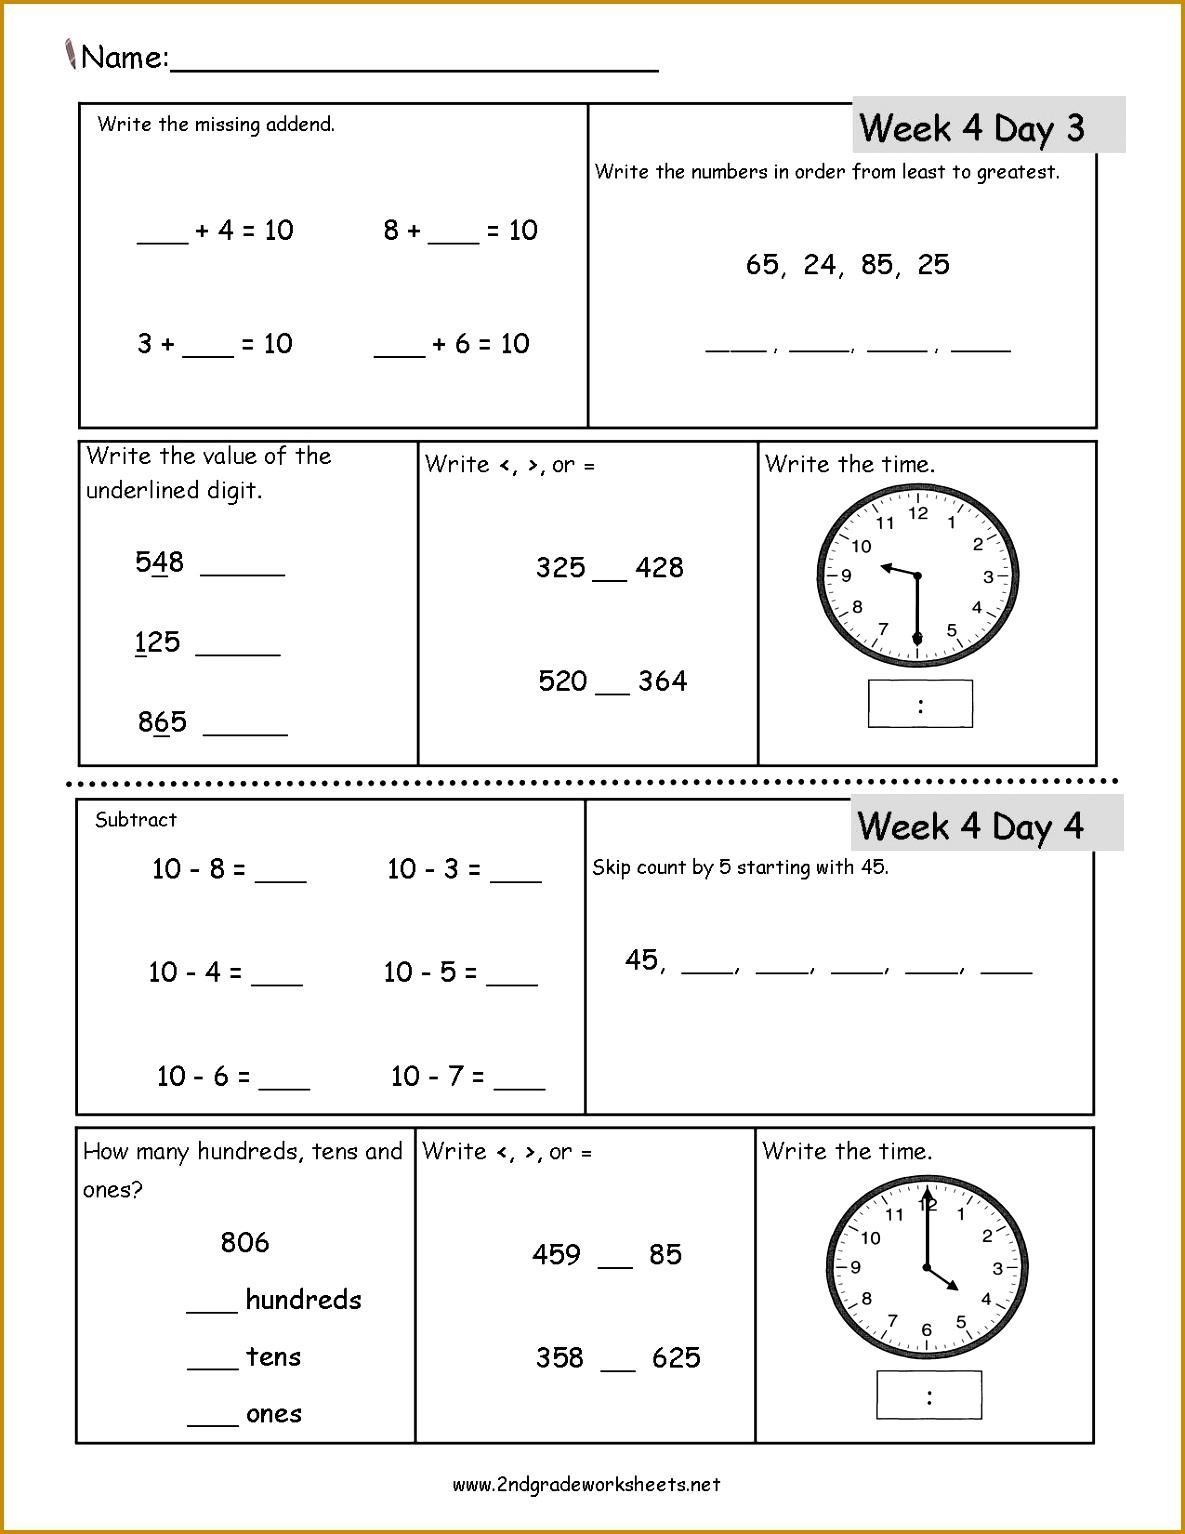 Teacher Worksheets For 2Nd Grade Worksheets for all Download and Worksheets 15341185